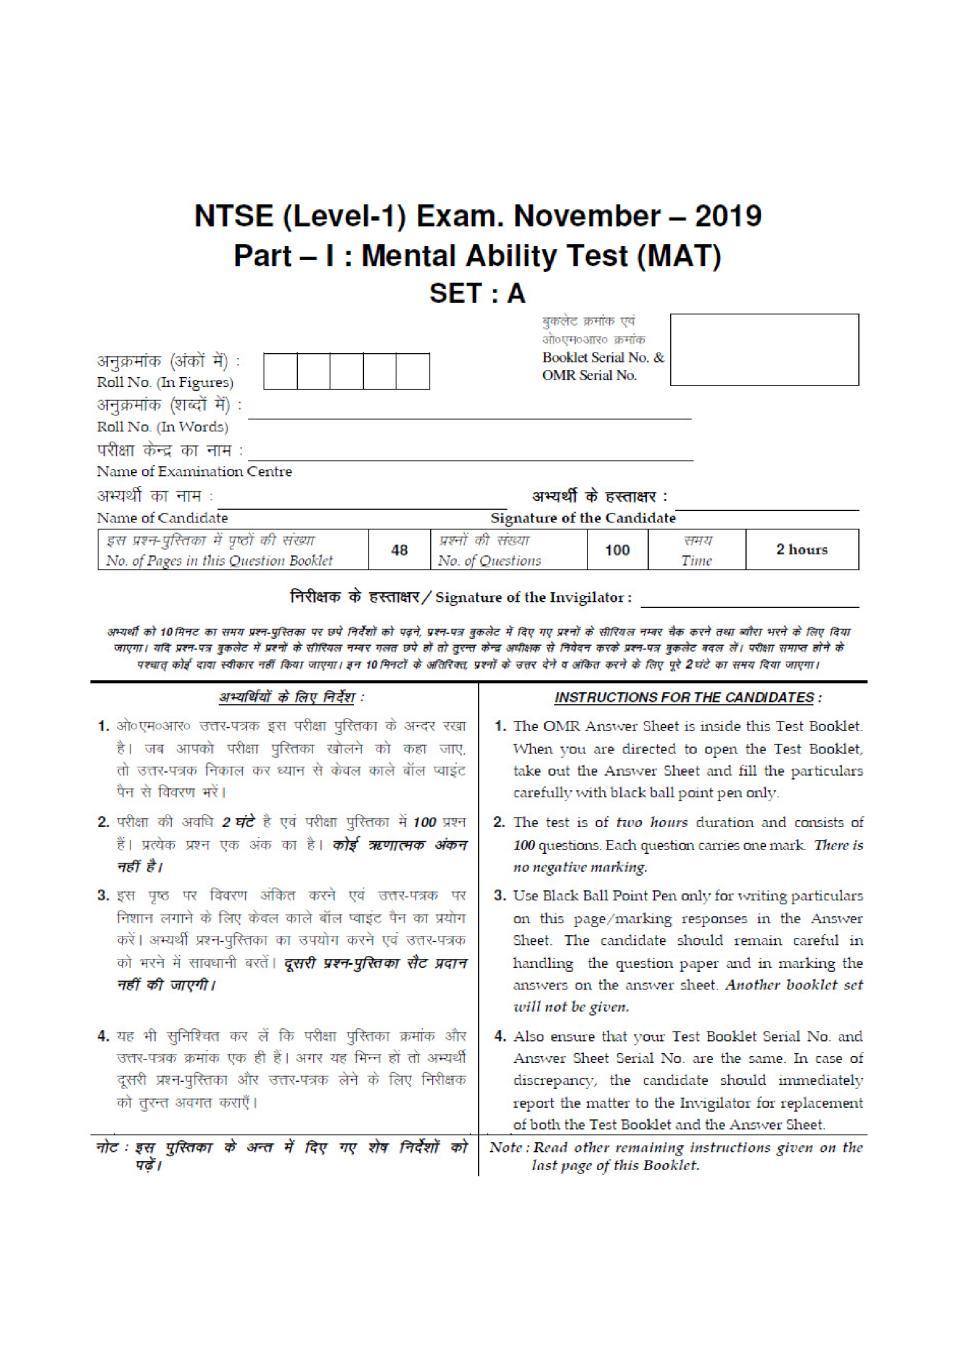 Haryana NTSE Nov 2019 MAT Question Paper Set A - Page 1